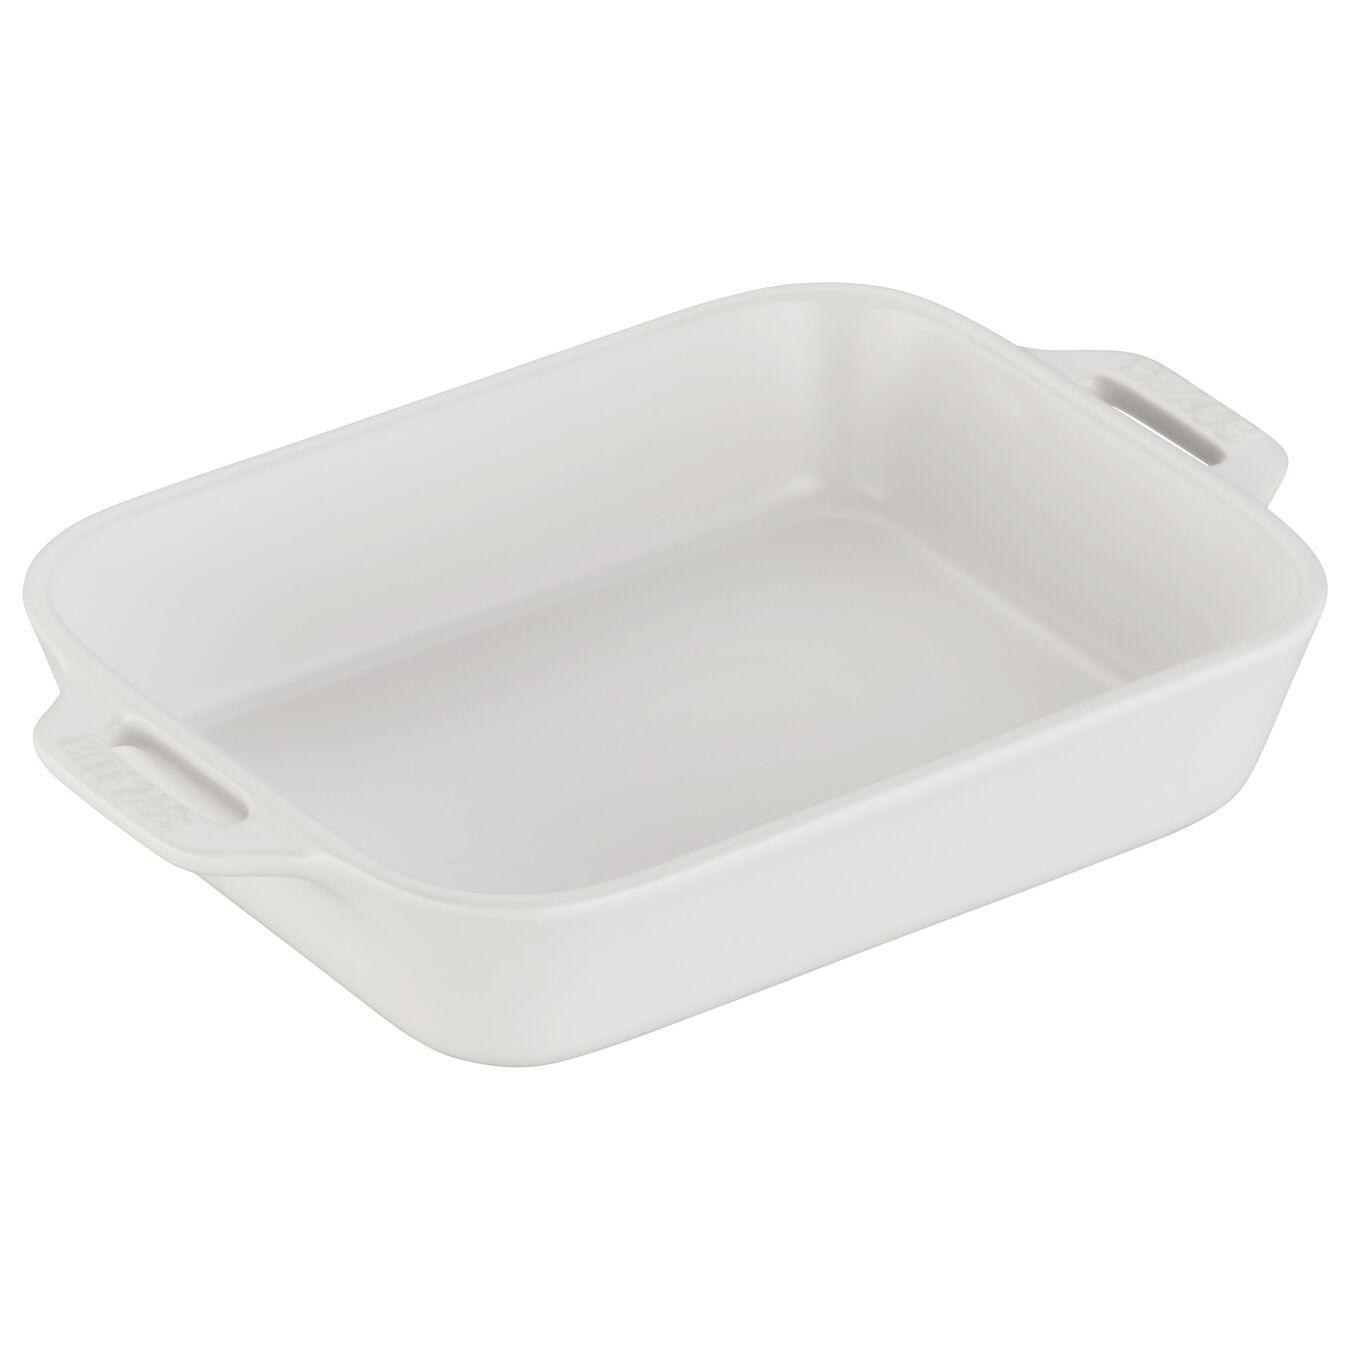 6.3 x 8-inch, rectangular, Oven dish, matte white,,large 1